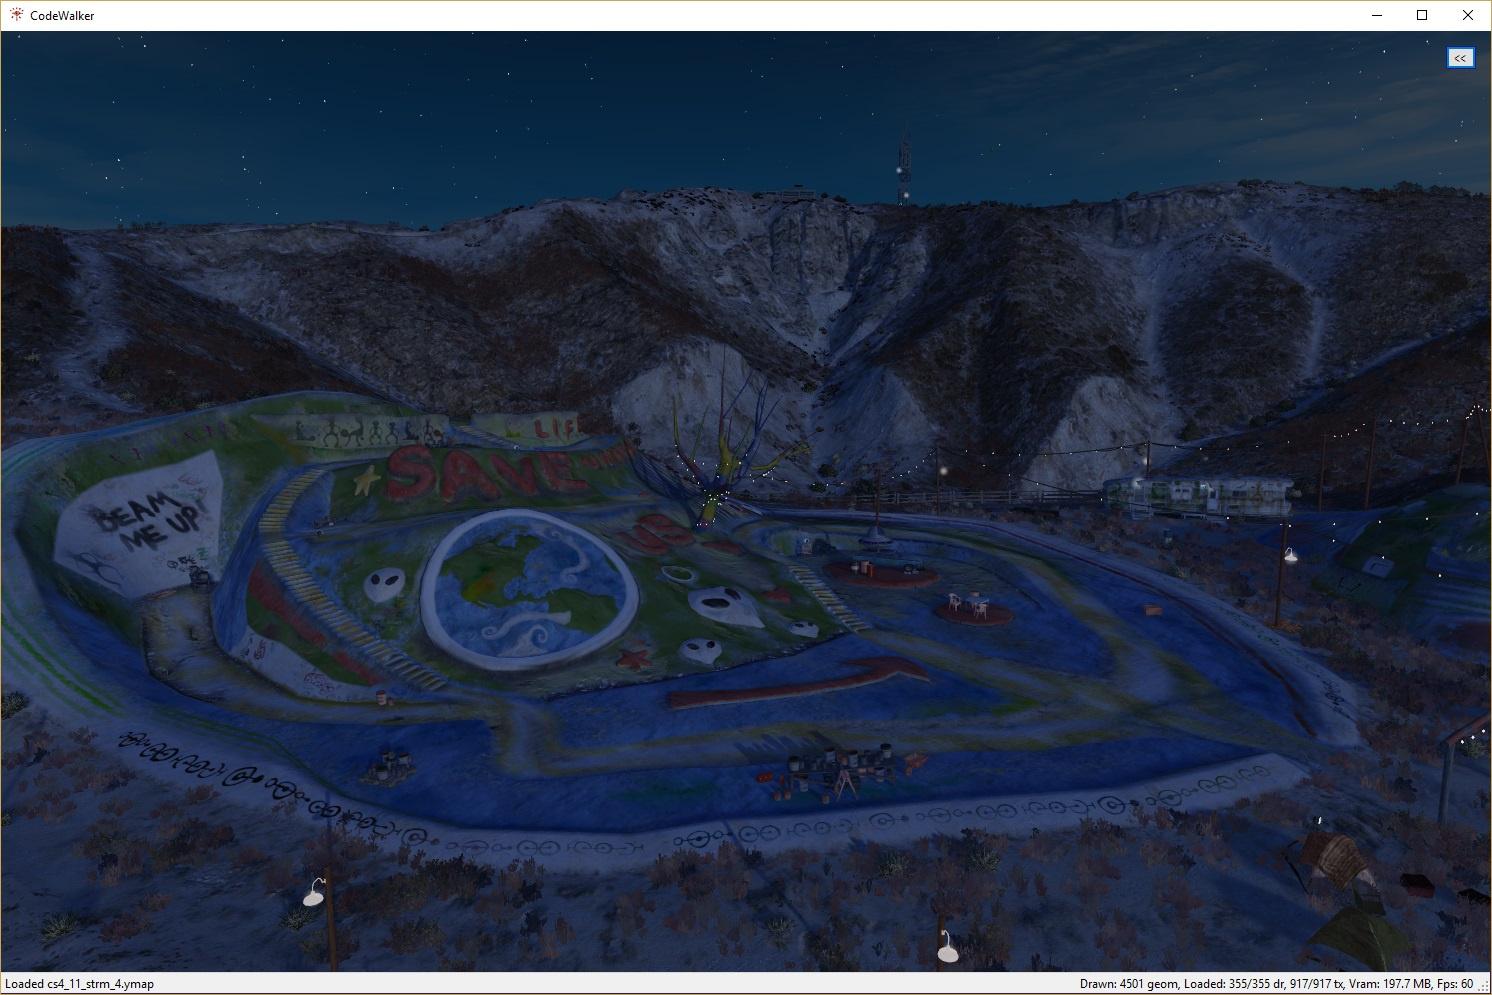 Codewalker gta v 3d map editor gta5 mods 99b39e cw34 gumiabroncs Image collections